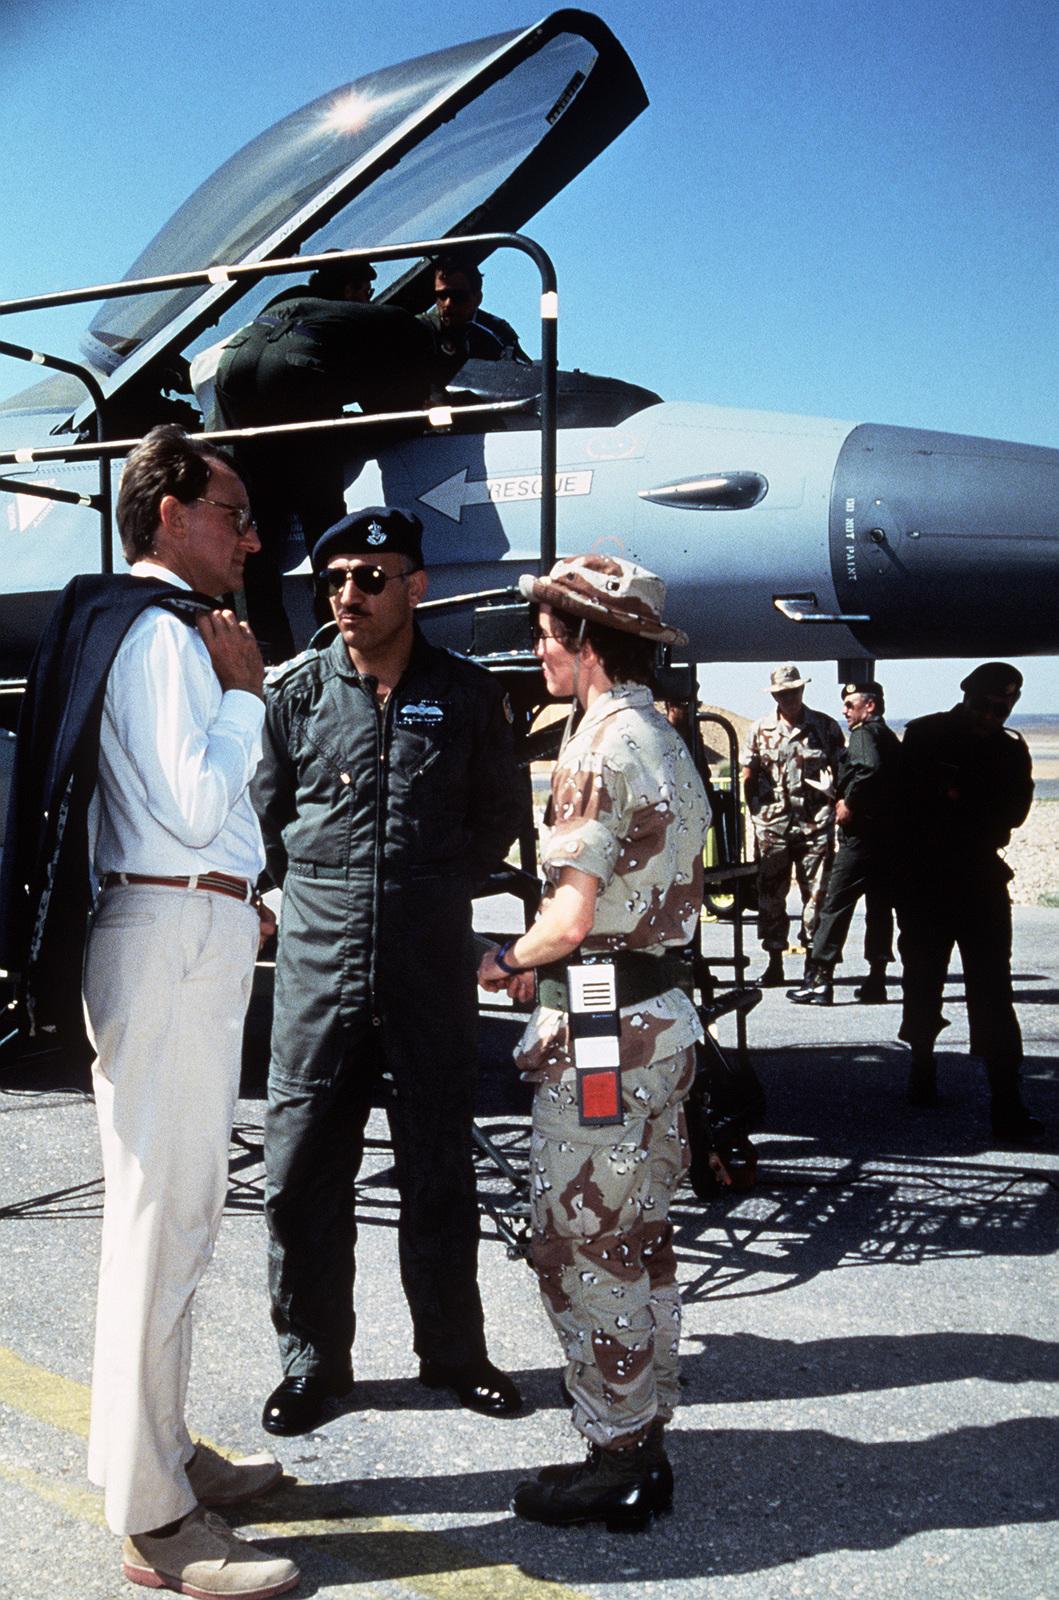 Paul Boeker, US ambassador to Jordan, talks with a member of